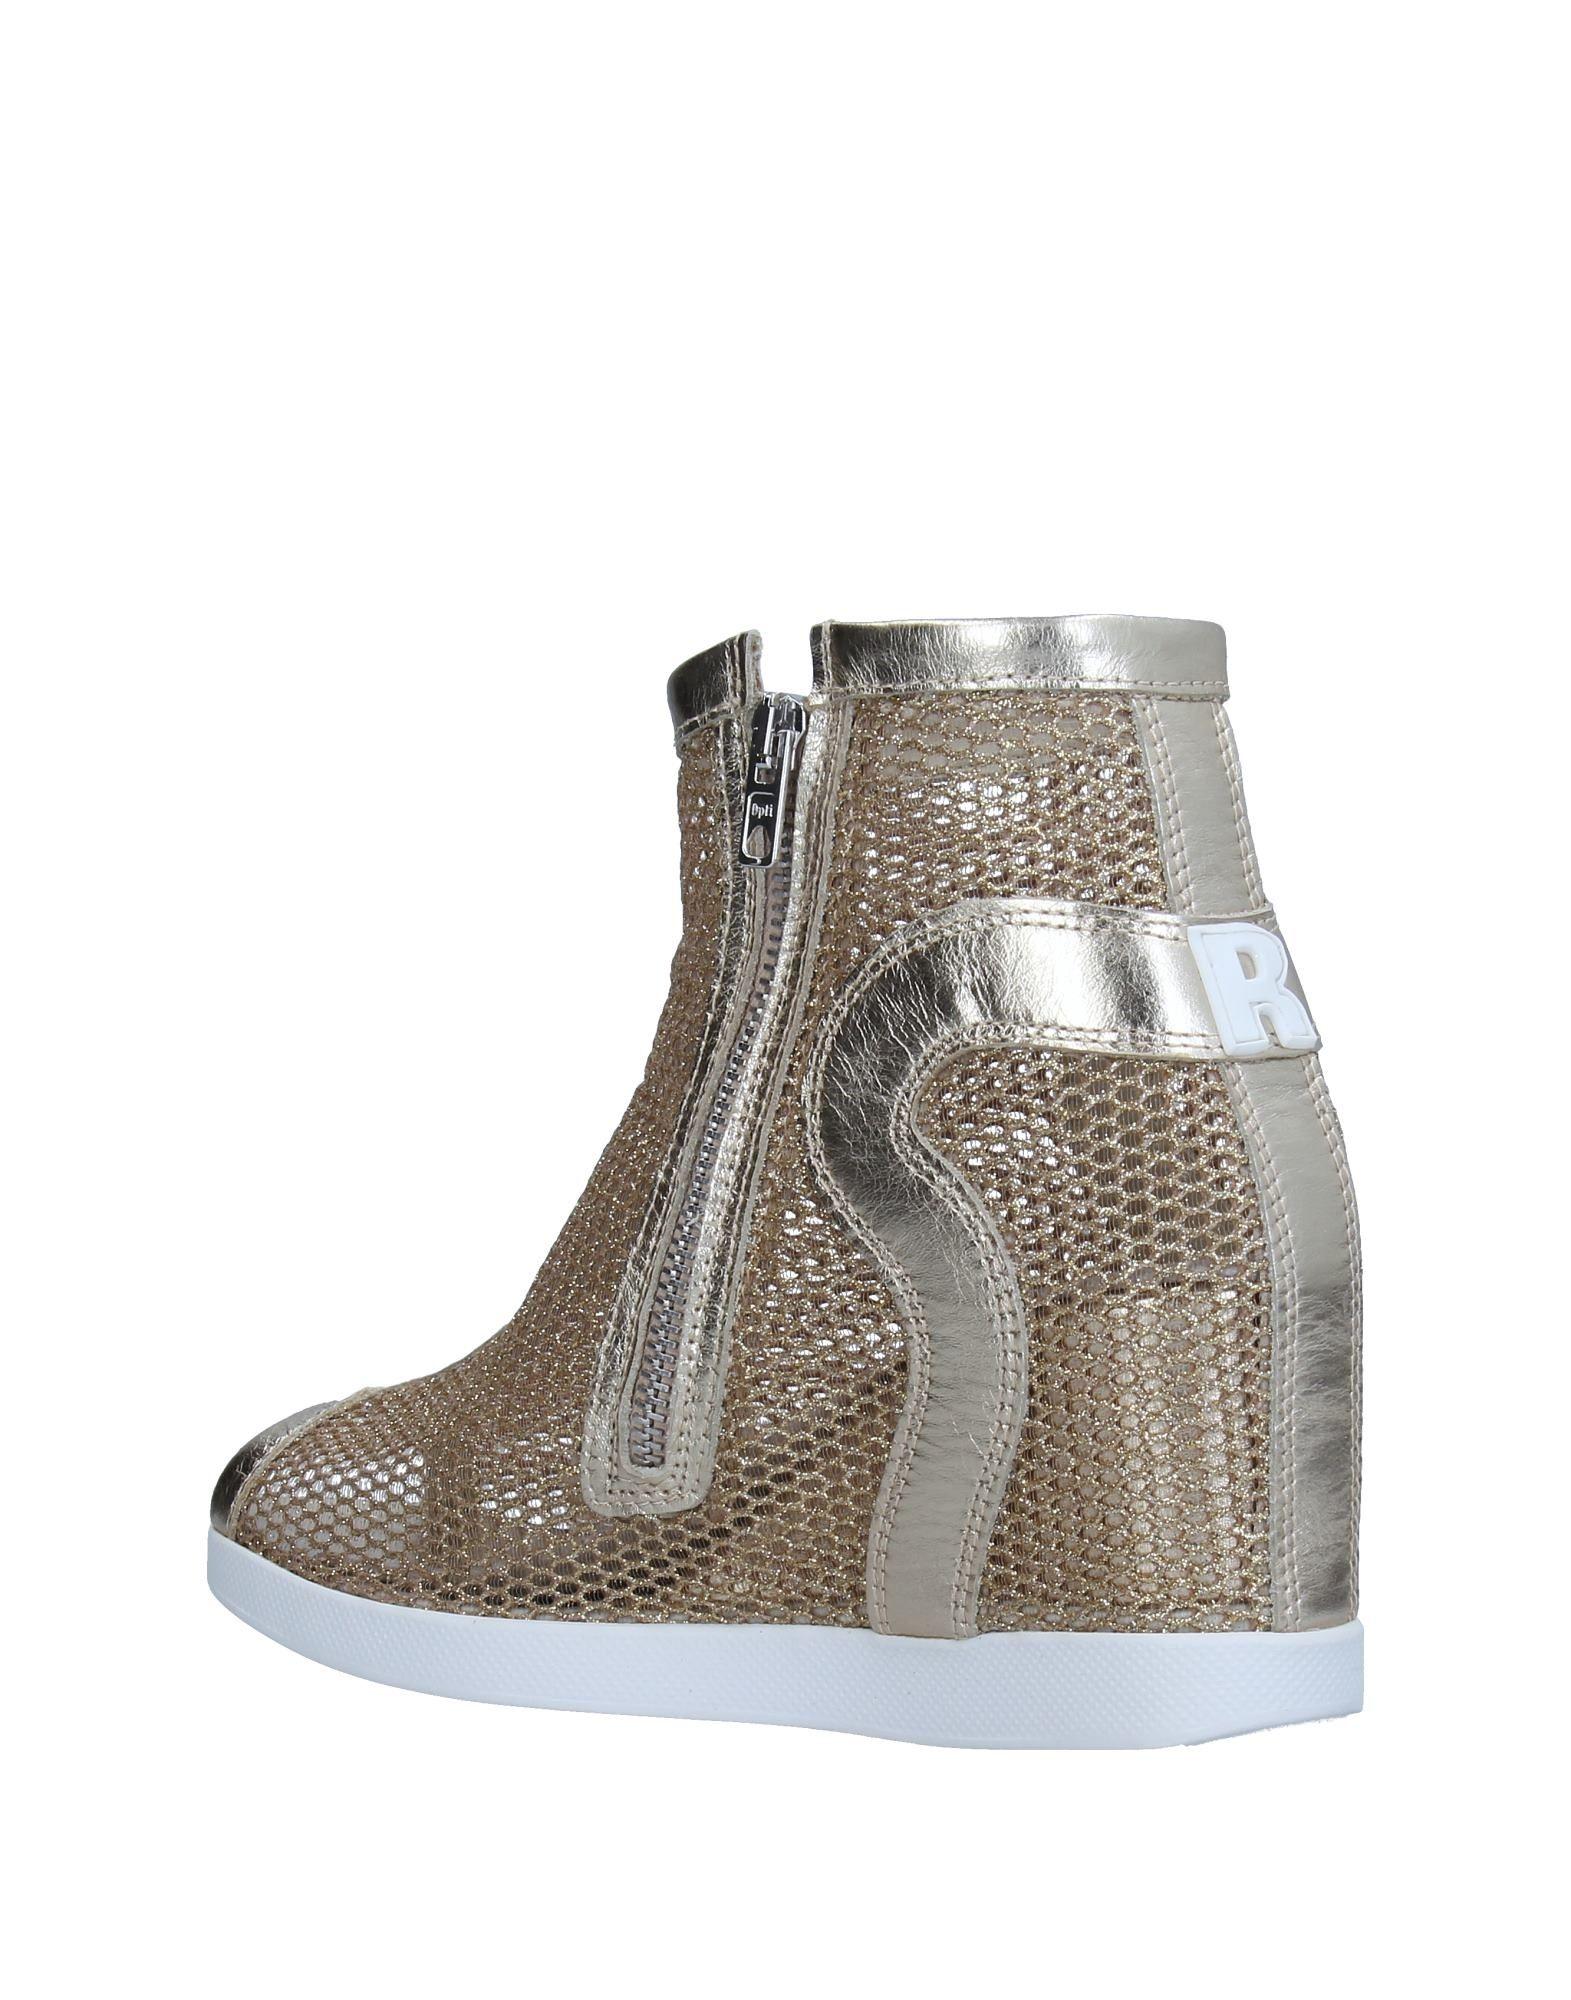 Ruco Line Schuhe Sneakers Damen  11334354WN Gute Qualität beliebte Schuhe Line a56df2